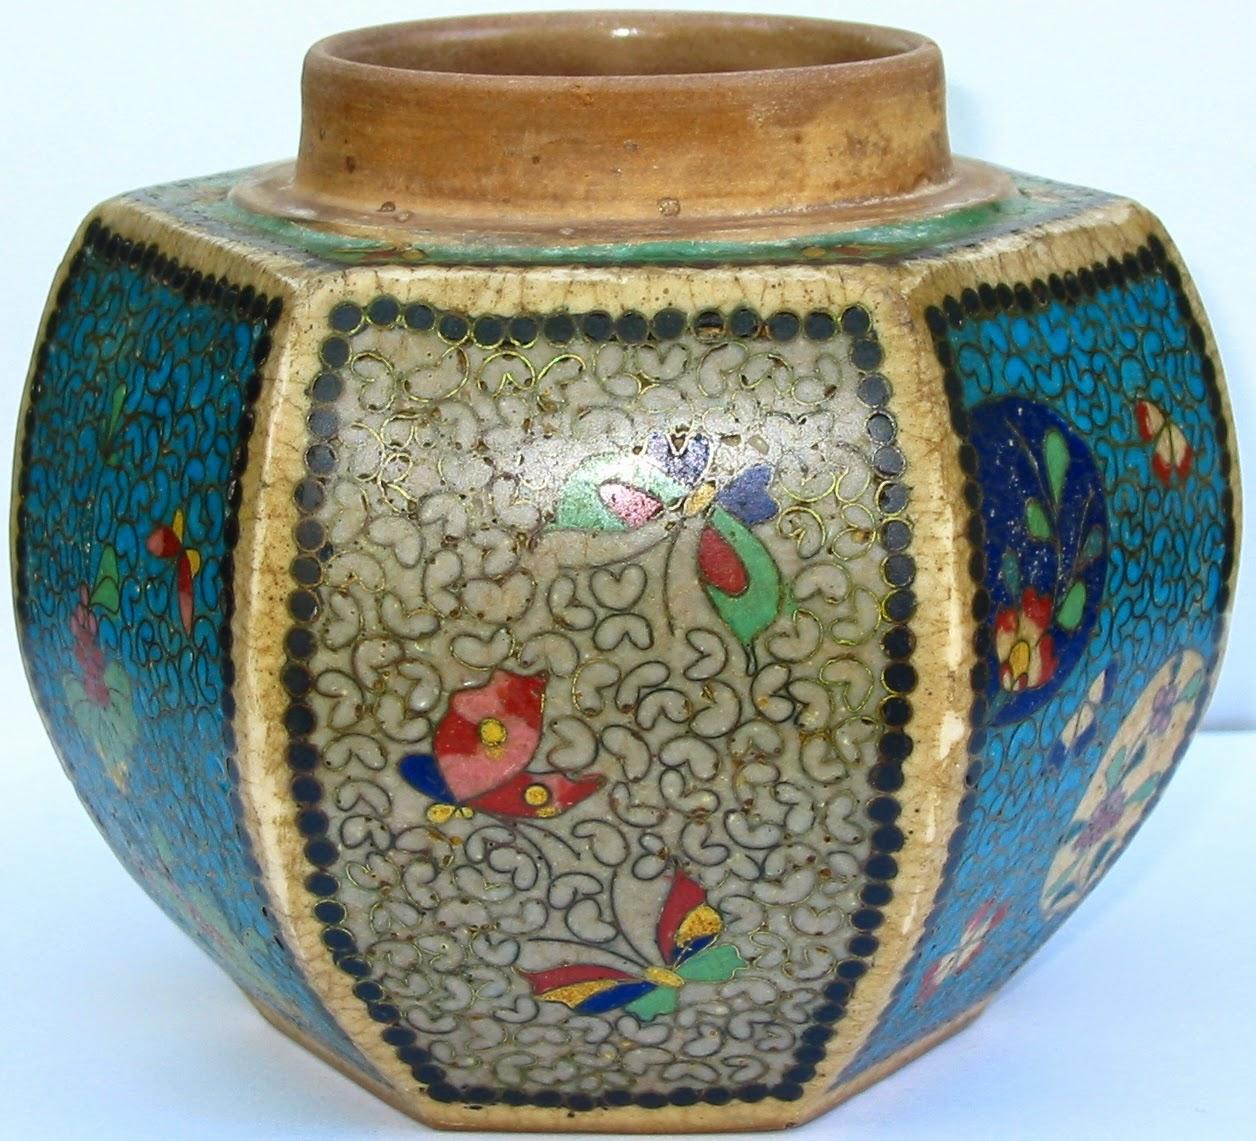 Lauragarnet Cloisonne On Porcelain Japanese Totai Ginger Jar Hexagonal Six Panel Jar Vase